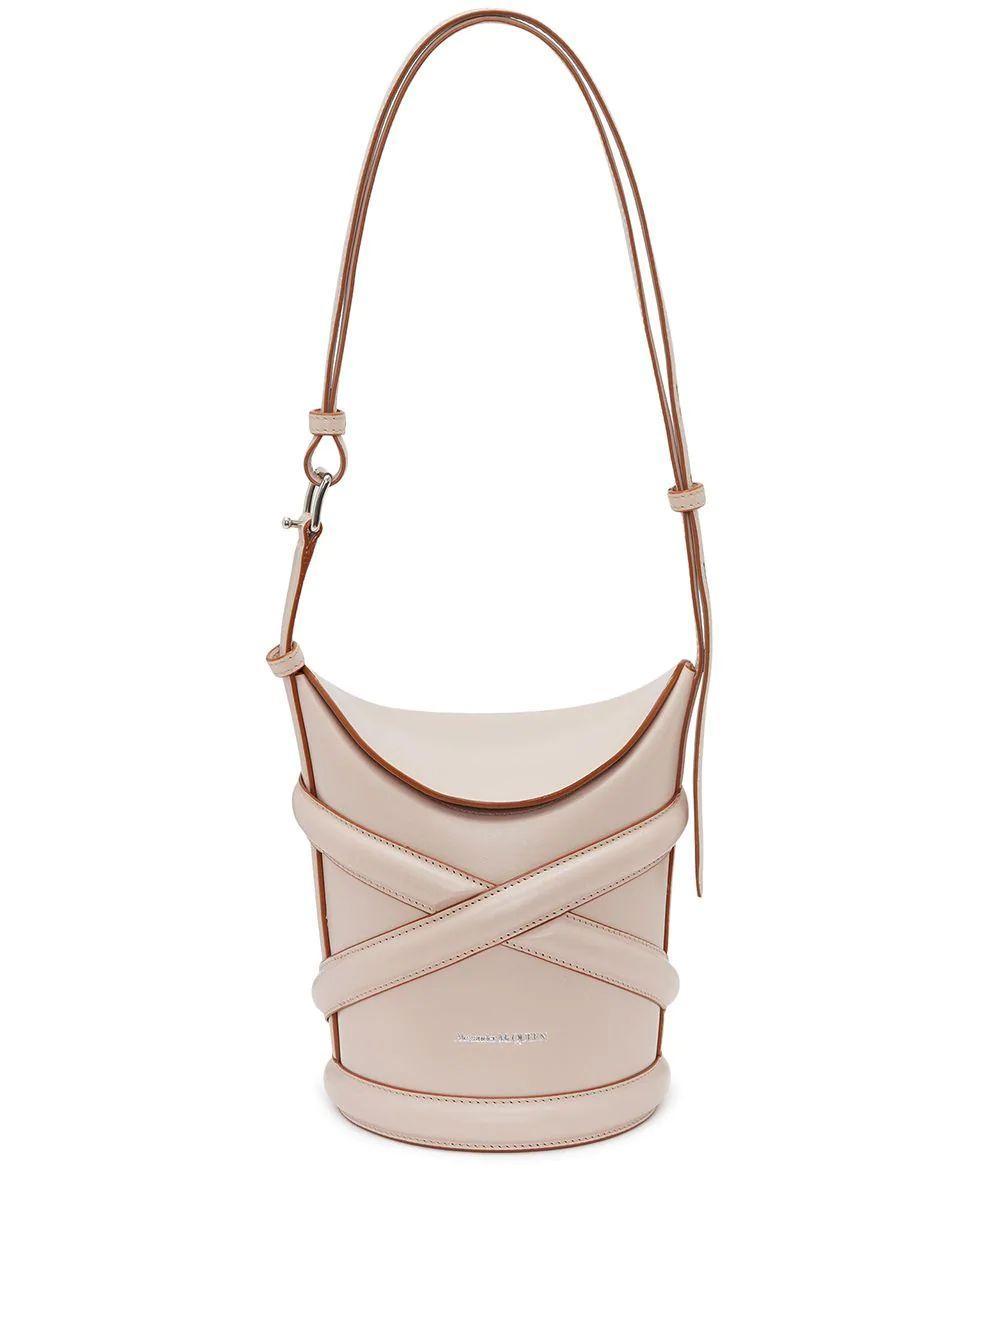 The Curve Bucket Bag